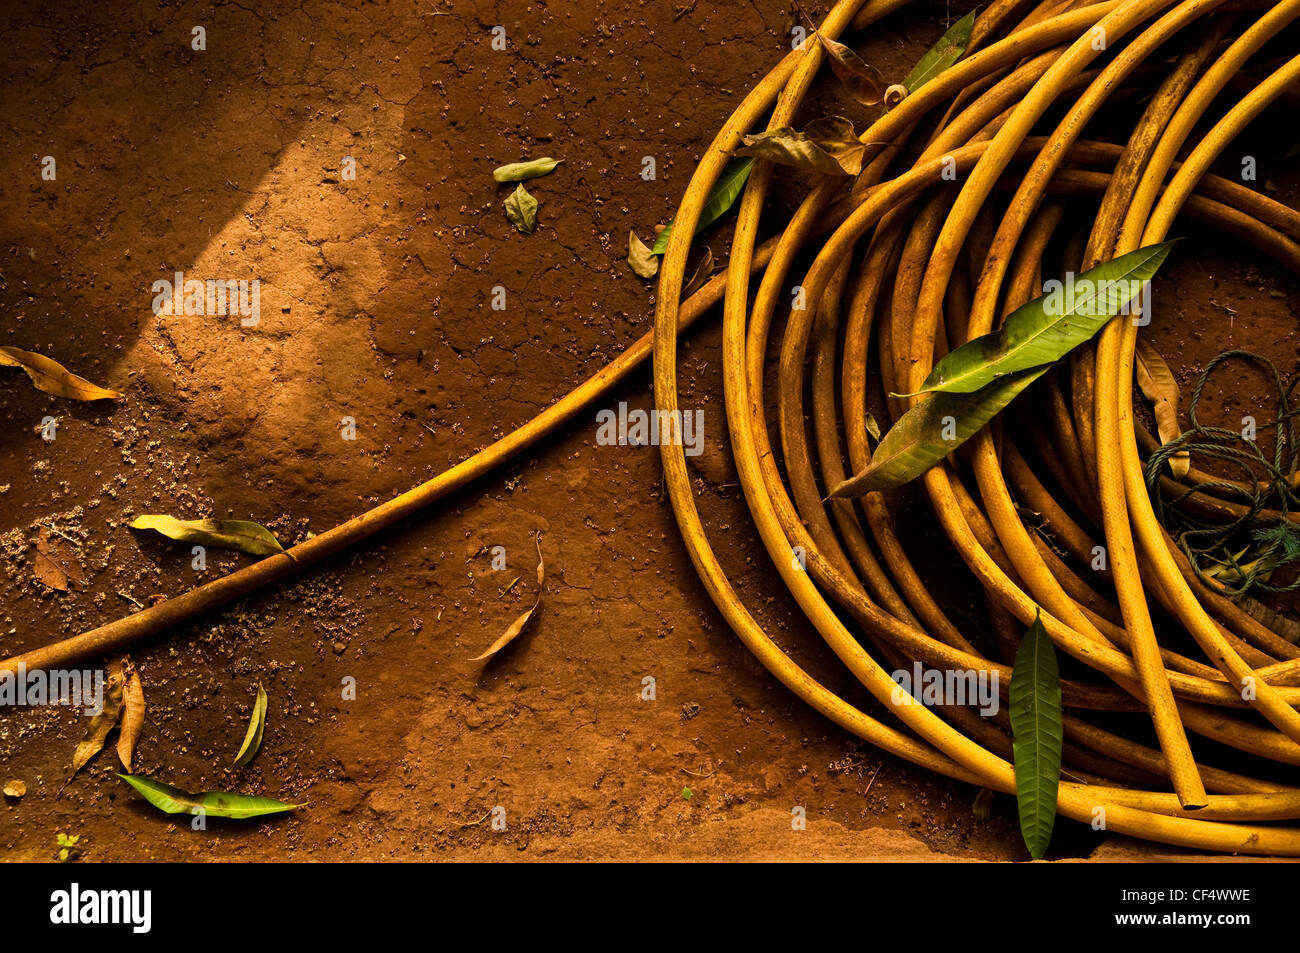 Yellow garden hose Stock Photo: 43748698 - Alamy